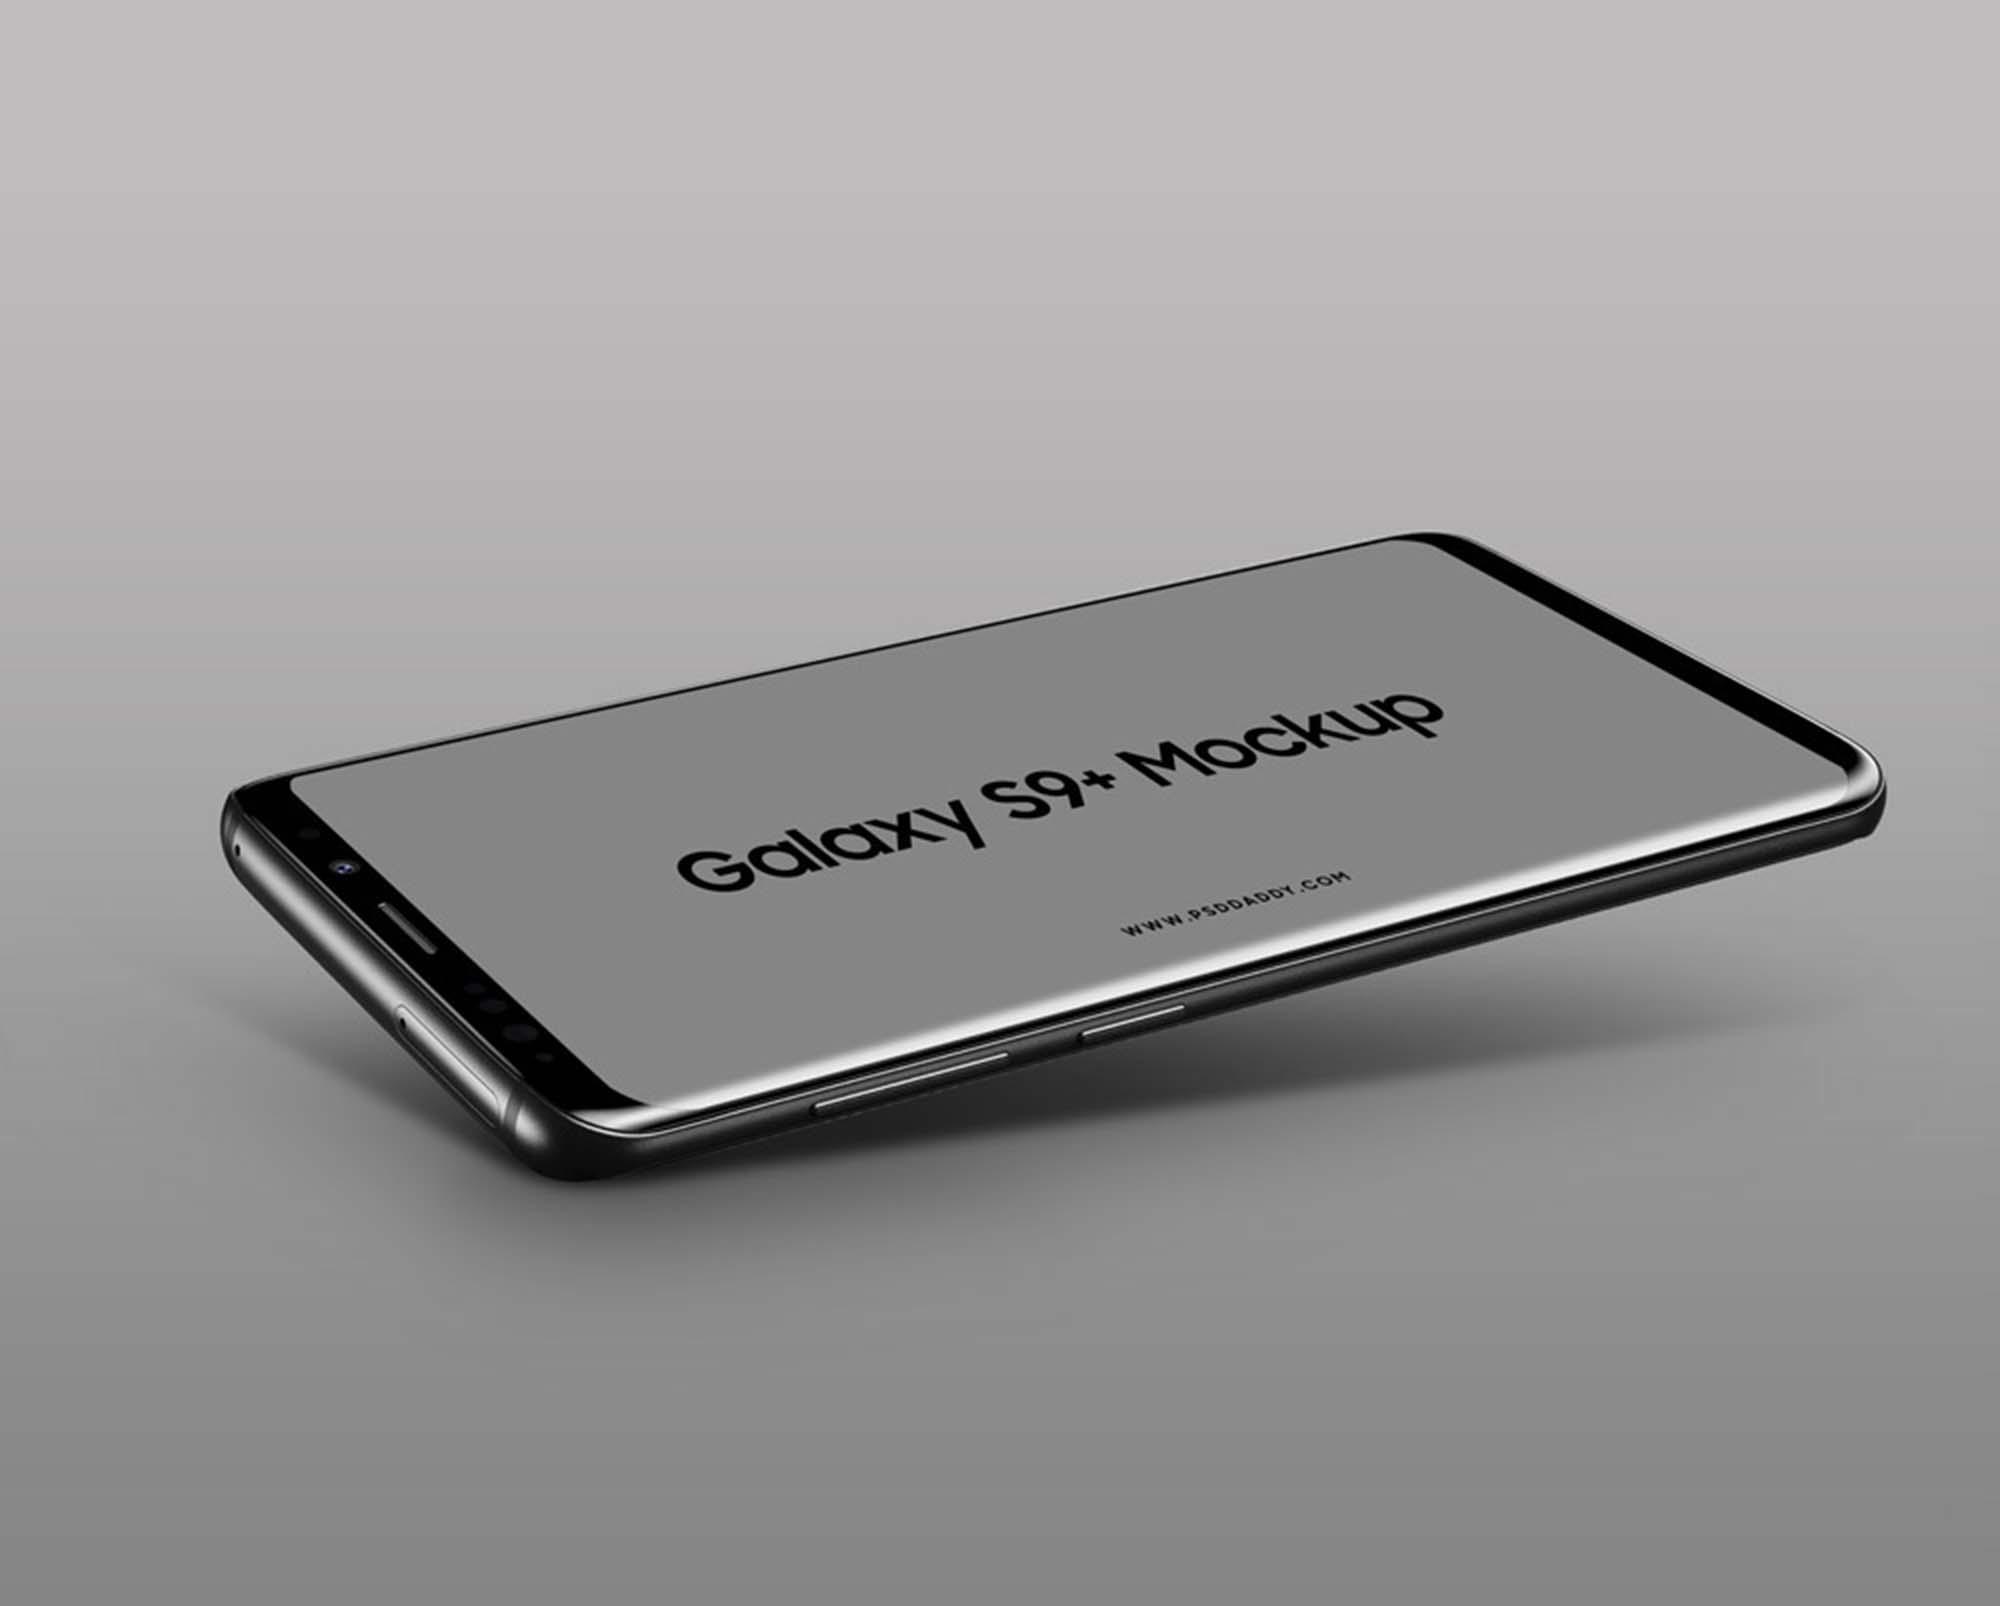 Samsung Galaxy S9 Plus Mockup